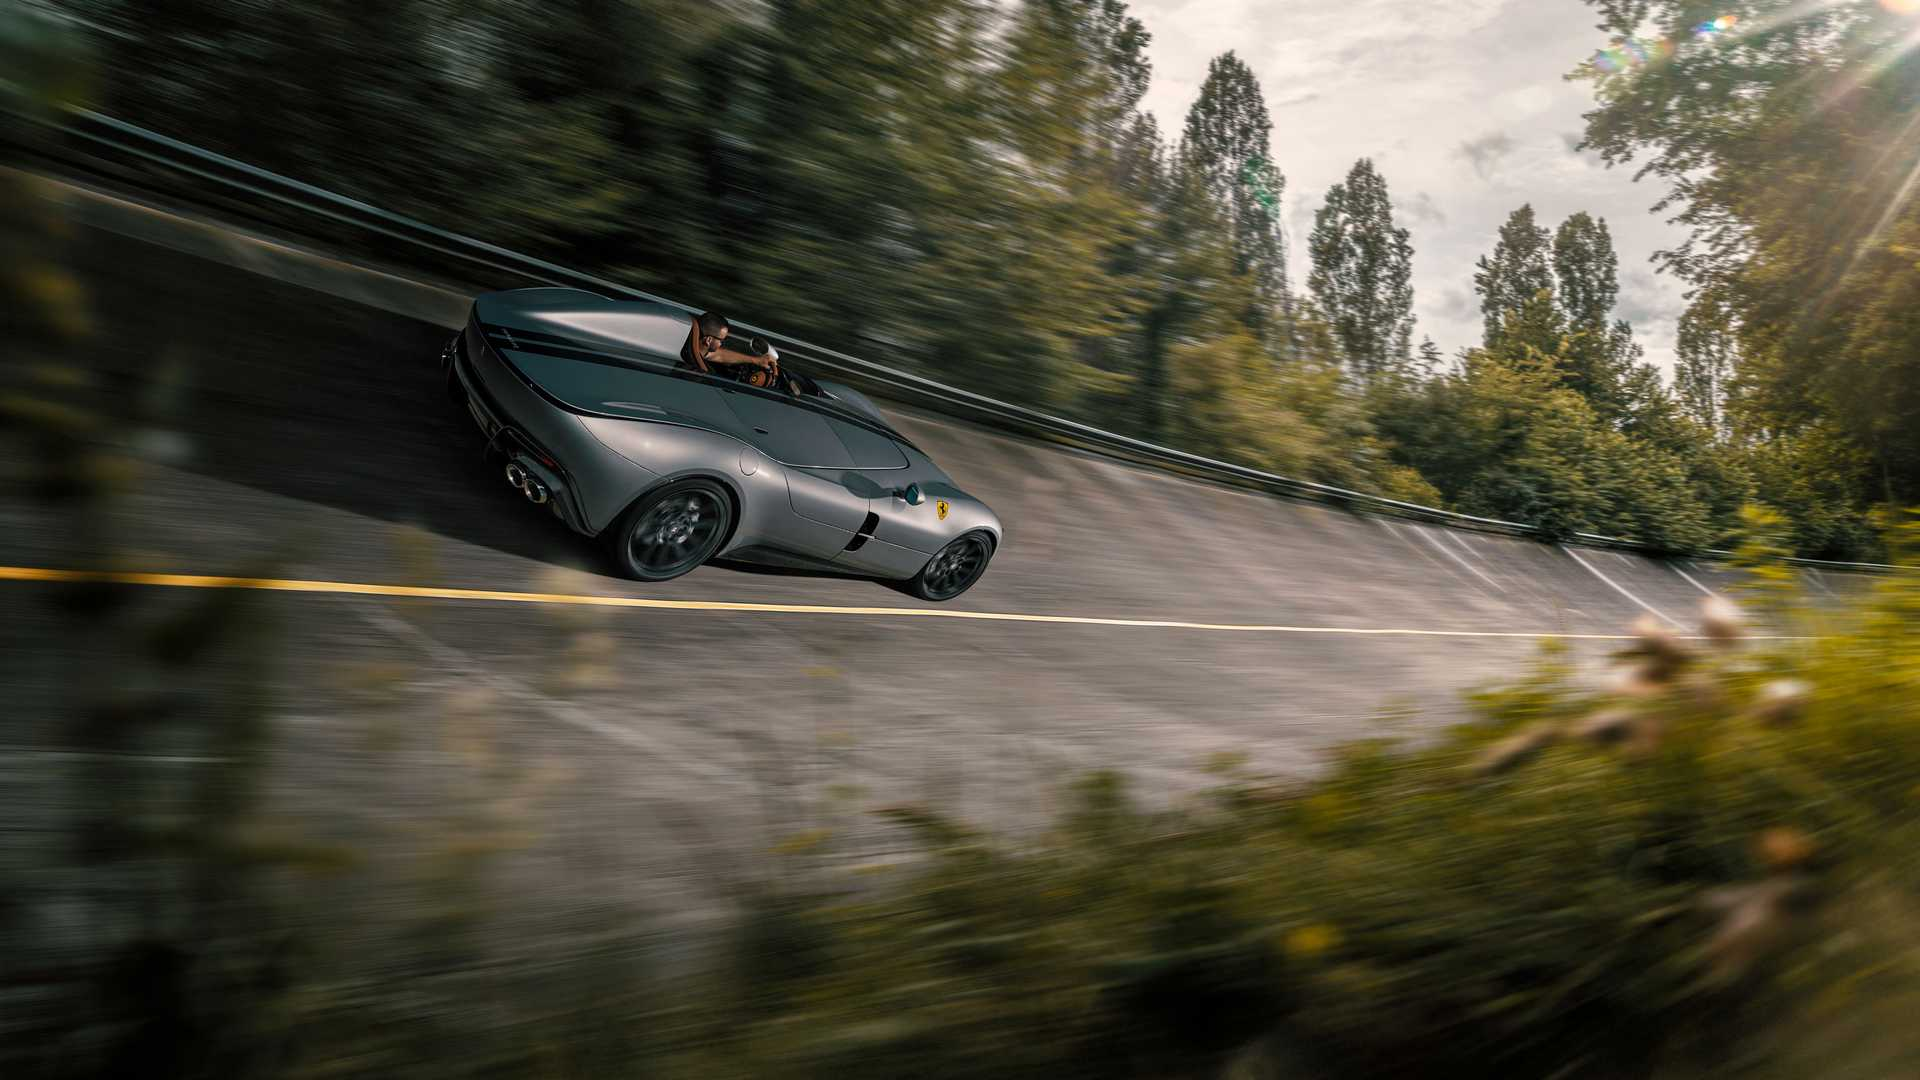 Ferrari_Monza_SP1_tuning_by_Novitec_0005